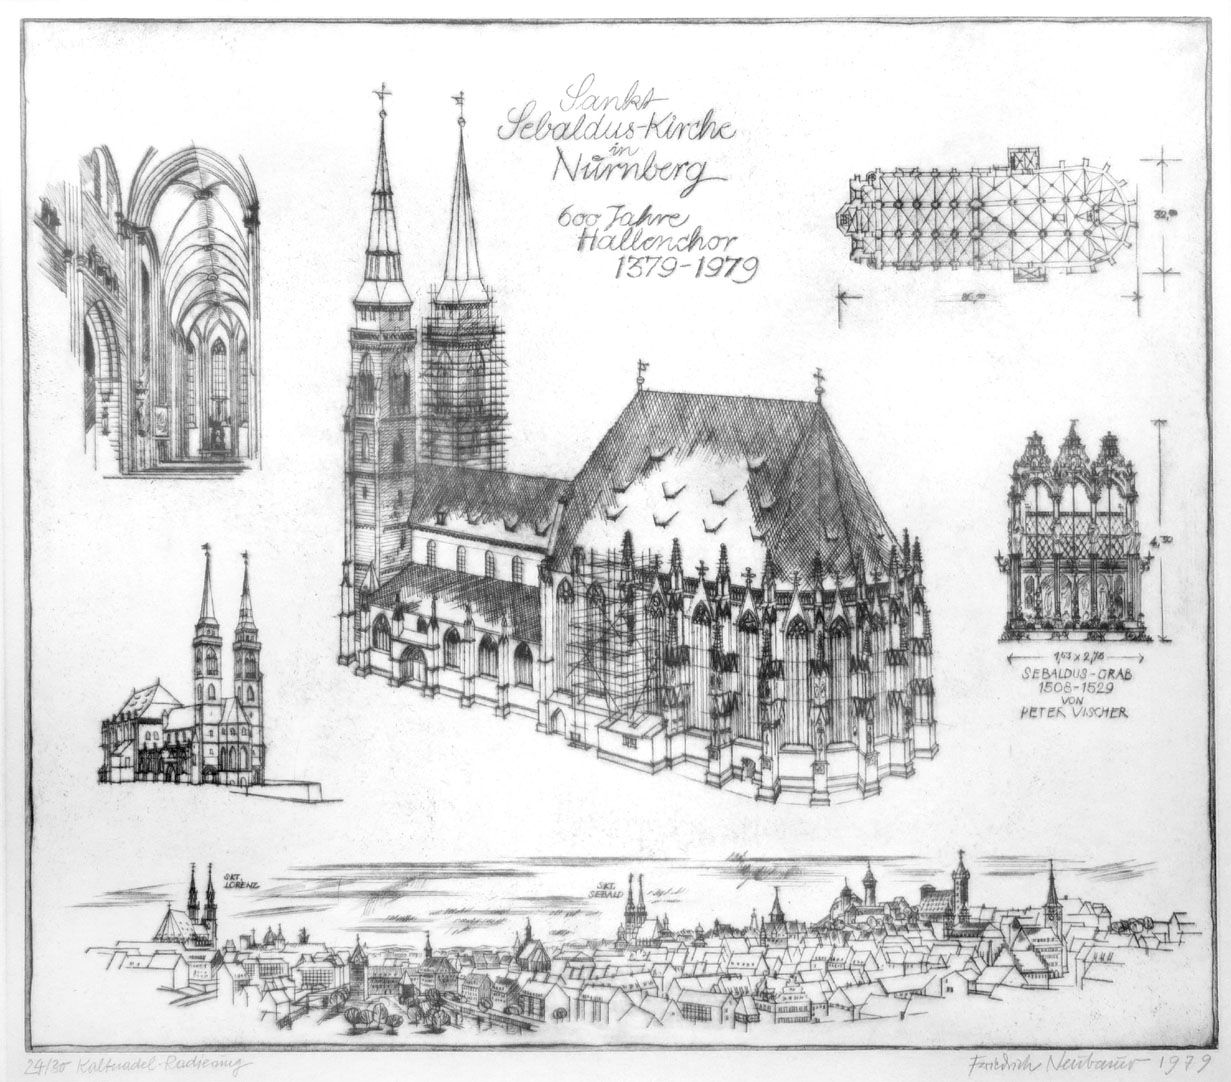 St. Sebaldus-Church in Nuremberg, 600 years hall choir, 1379 - 1979 Total view